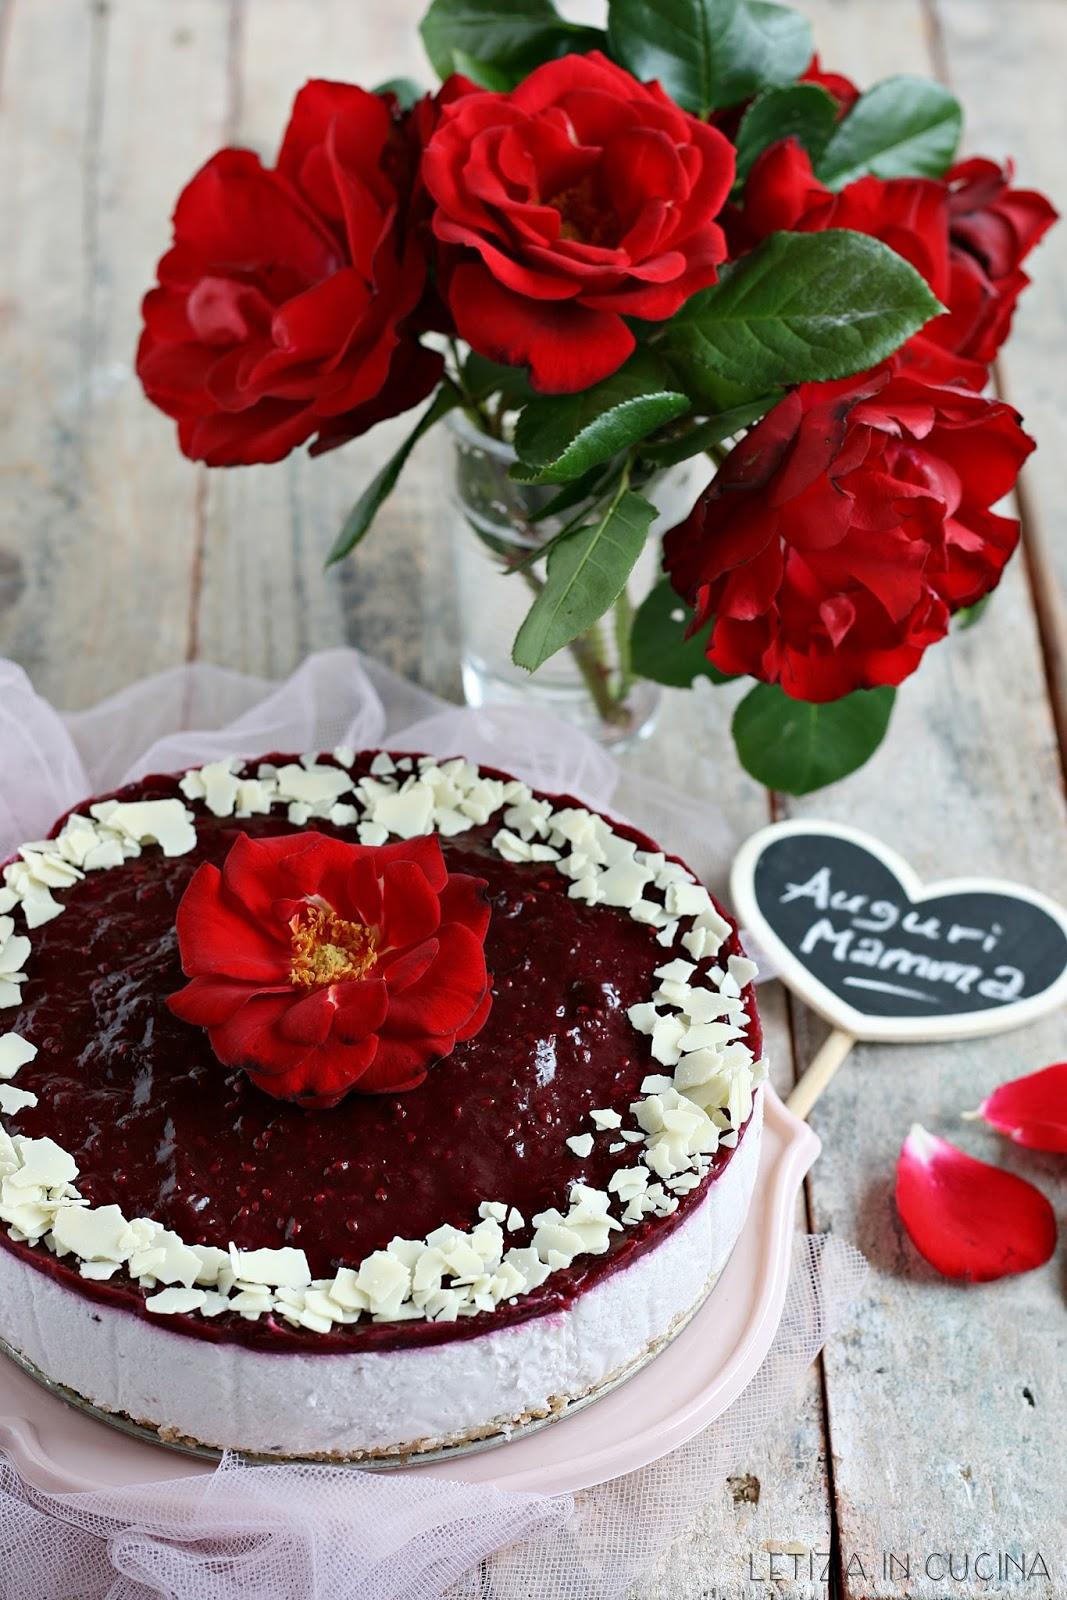 Letizia in Cucina: Cheesecake ai frutti di bosco